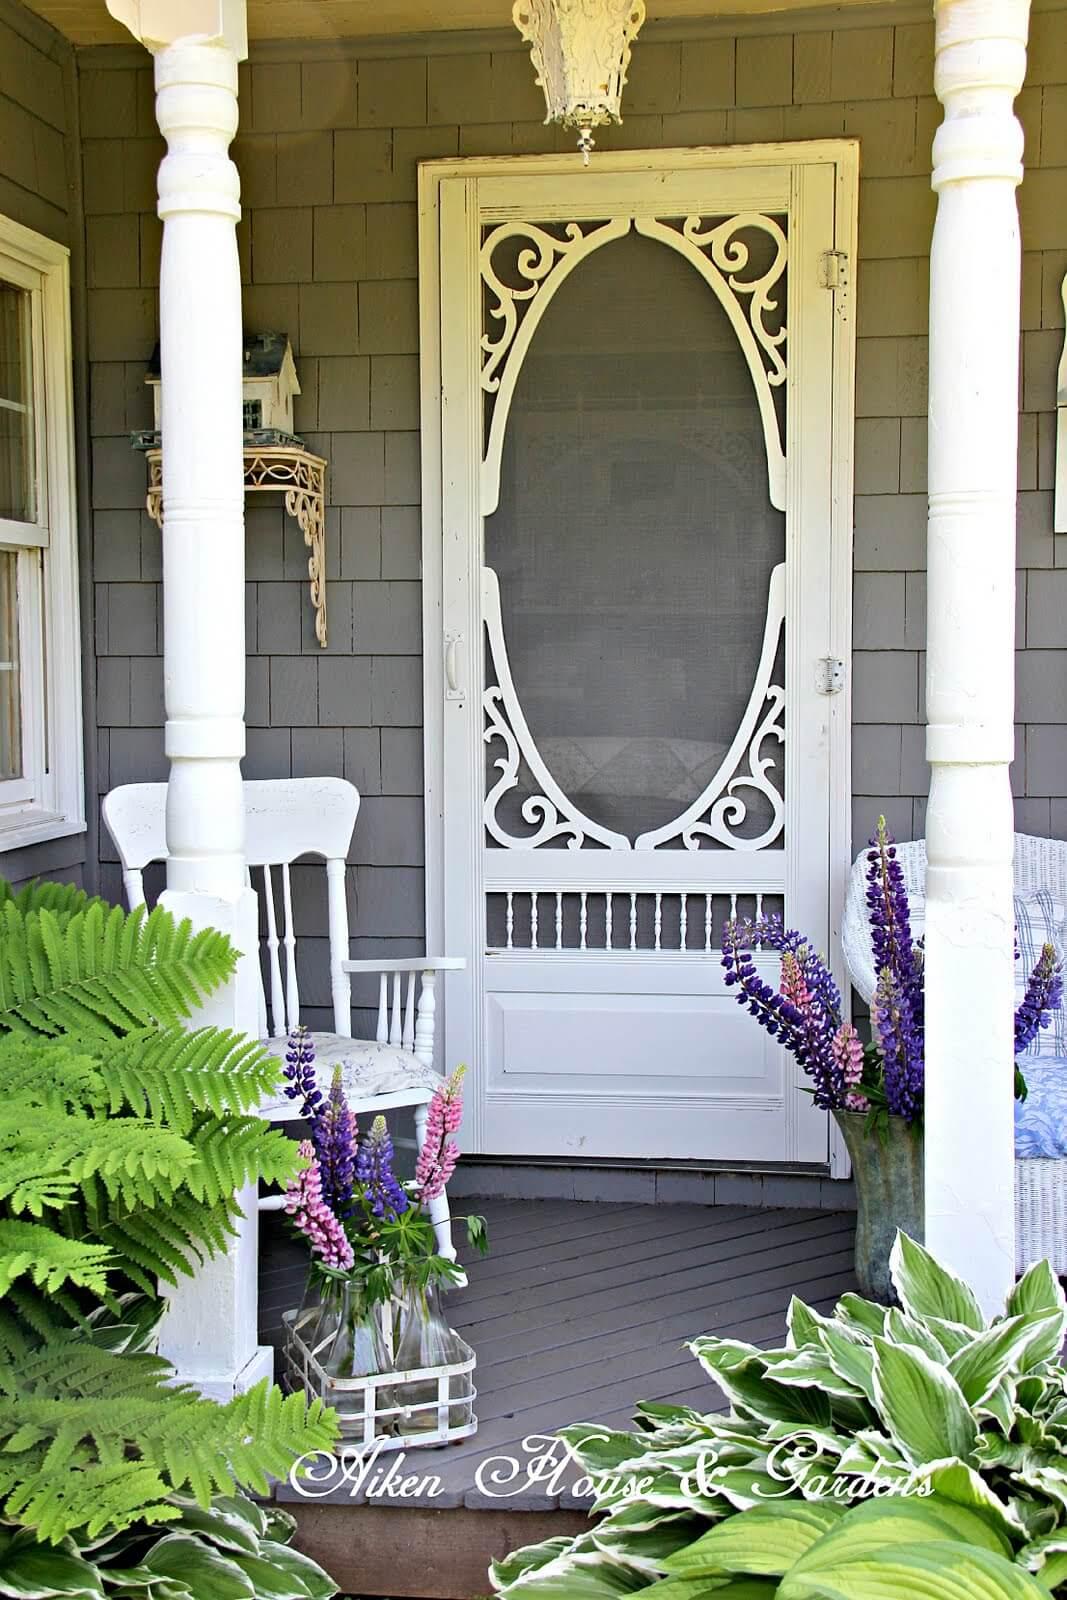 Fairytale Gingerbread Front Porch Design